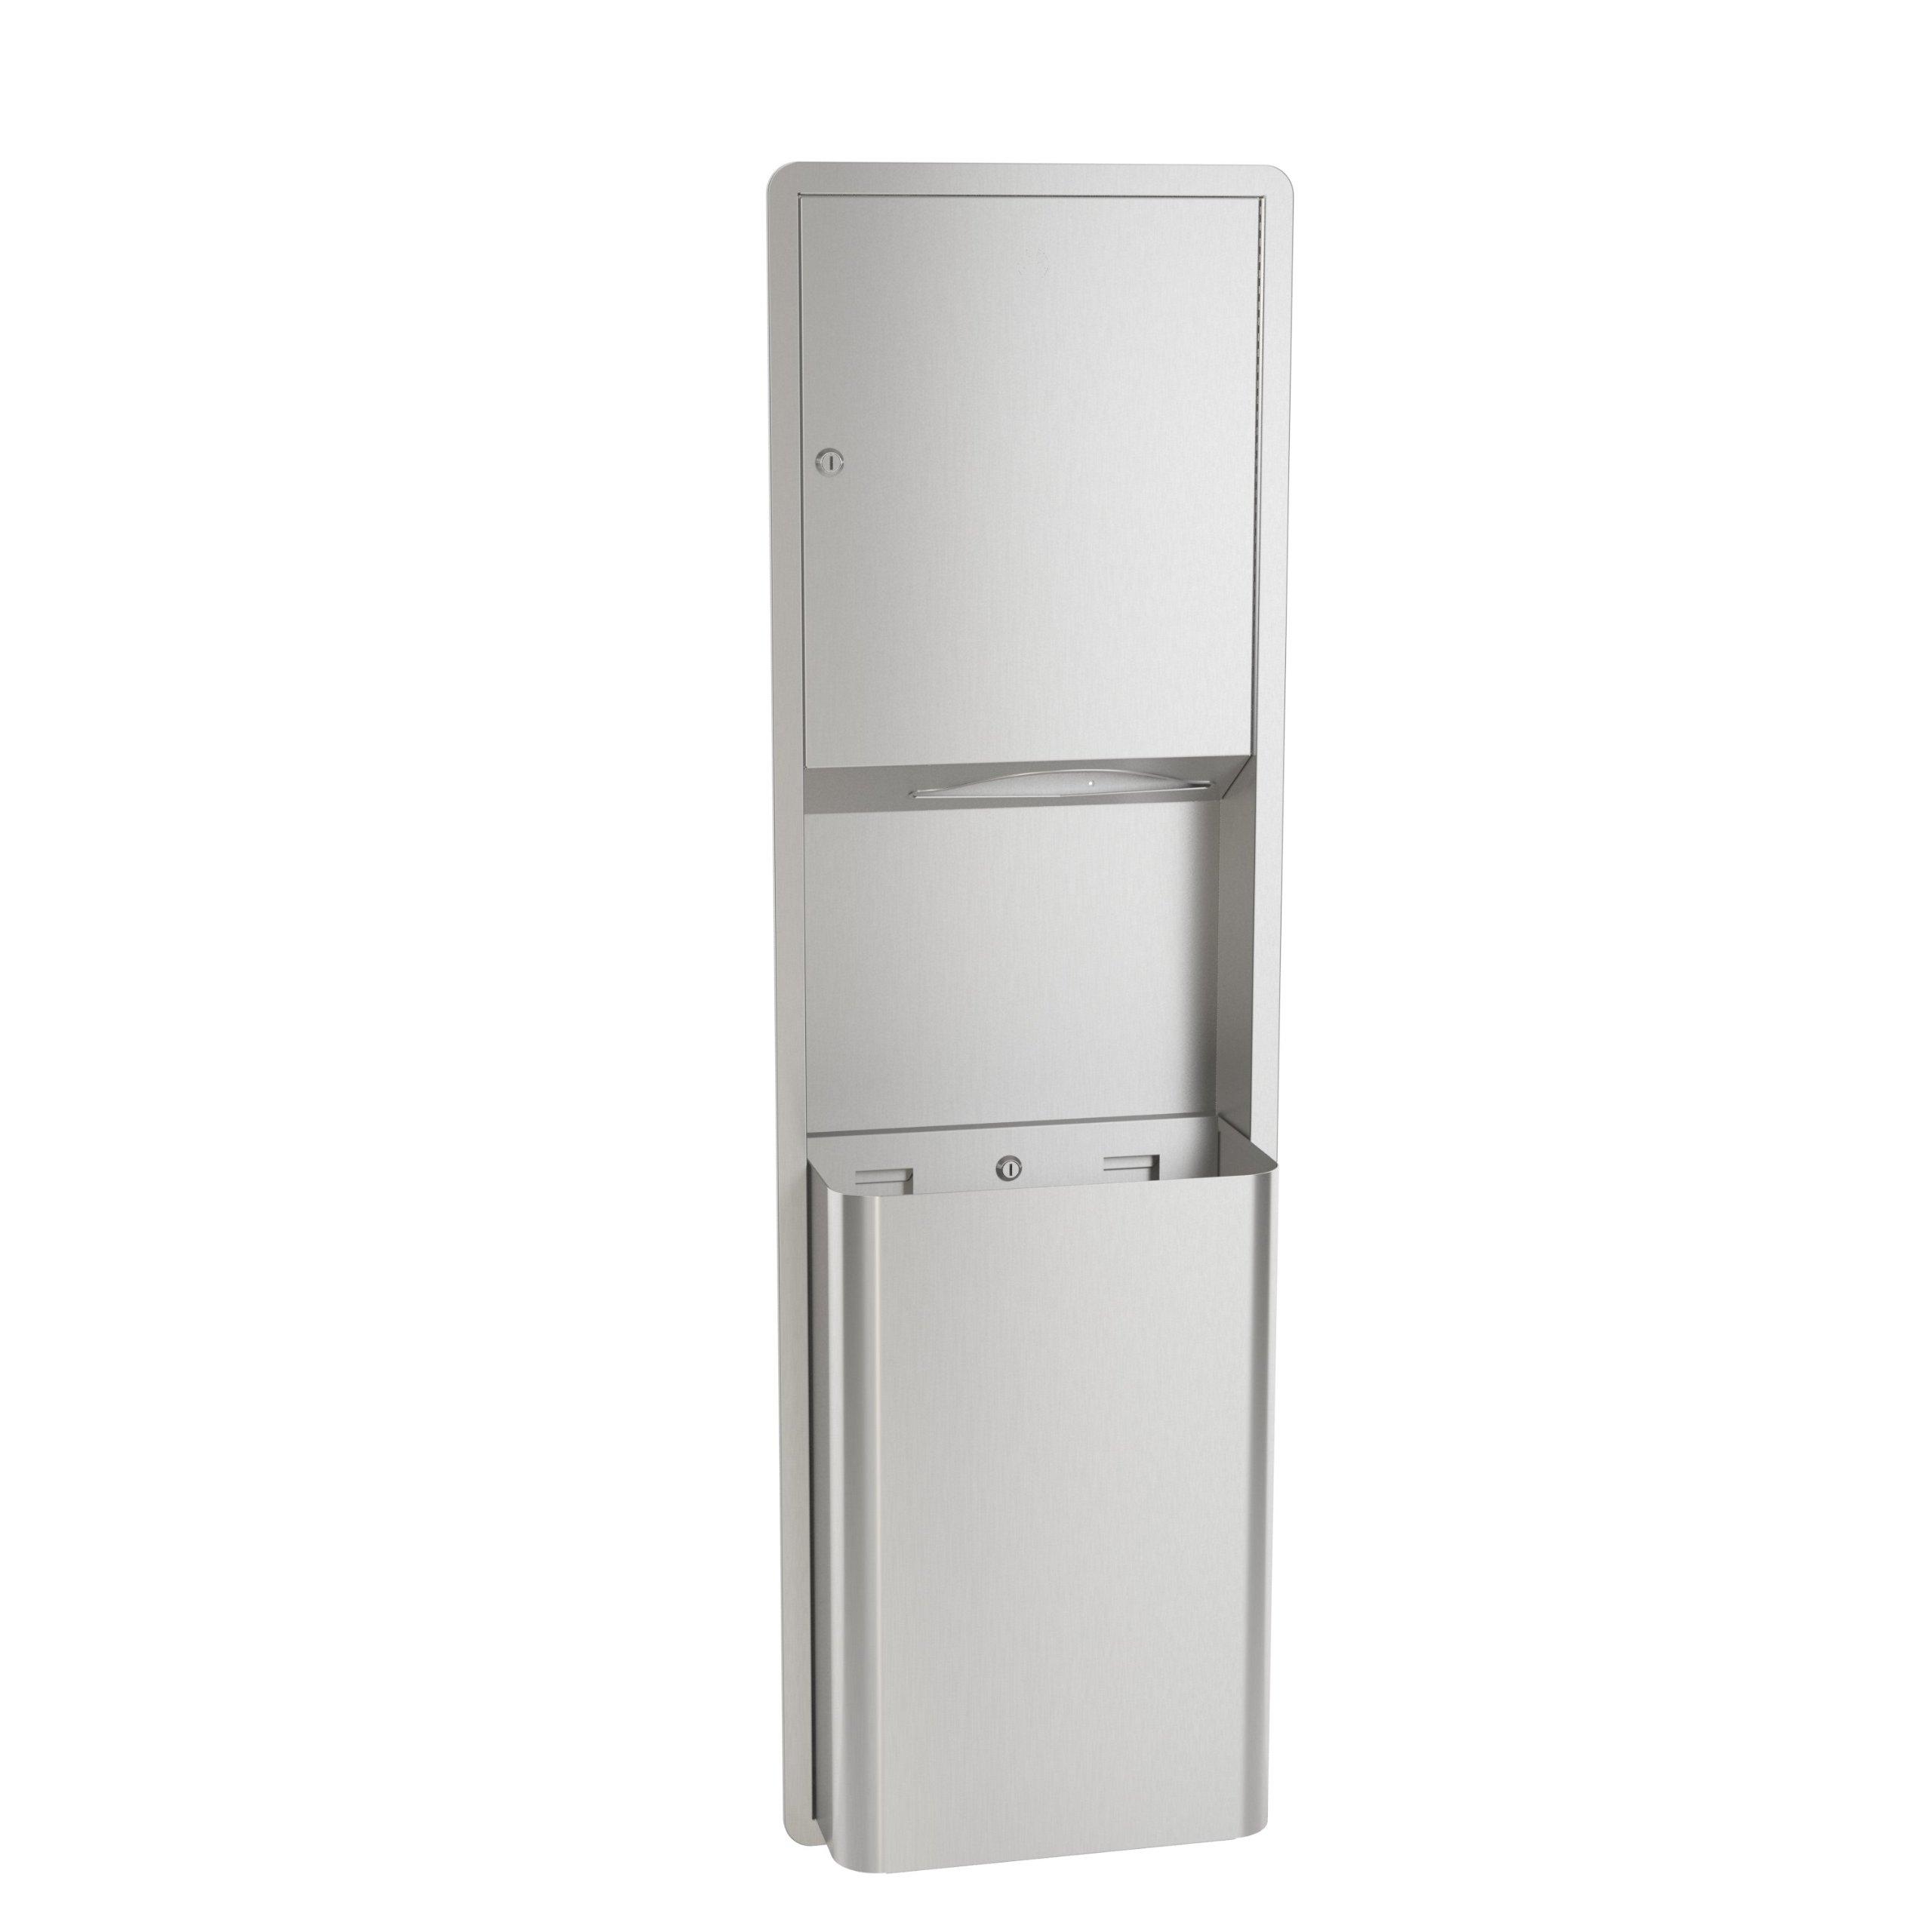 Bradley 234-100000 Standard Stainless Steel Semi-Recessed Mounted Towel Dispenser/Waste Receptacle, 17-1/8'' Width x 56'' Height x 8-25/32'' Depth